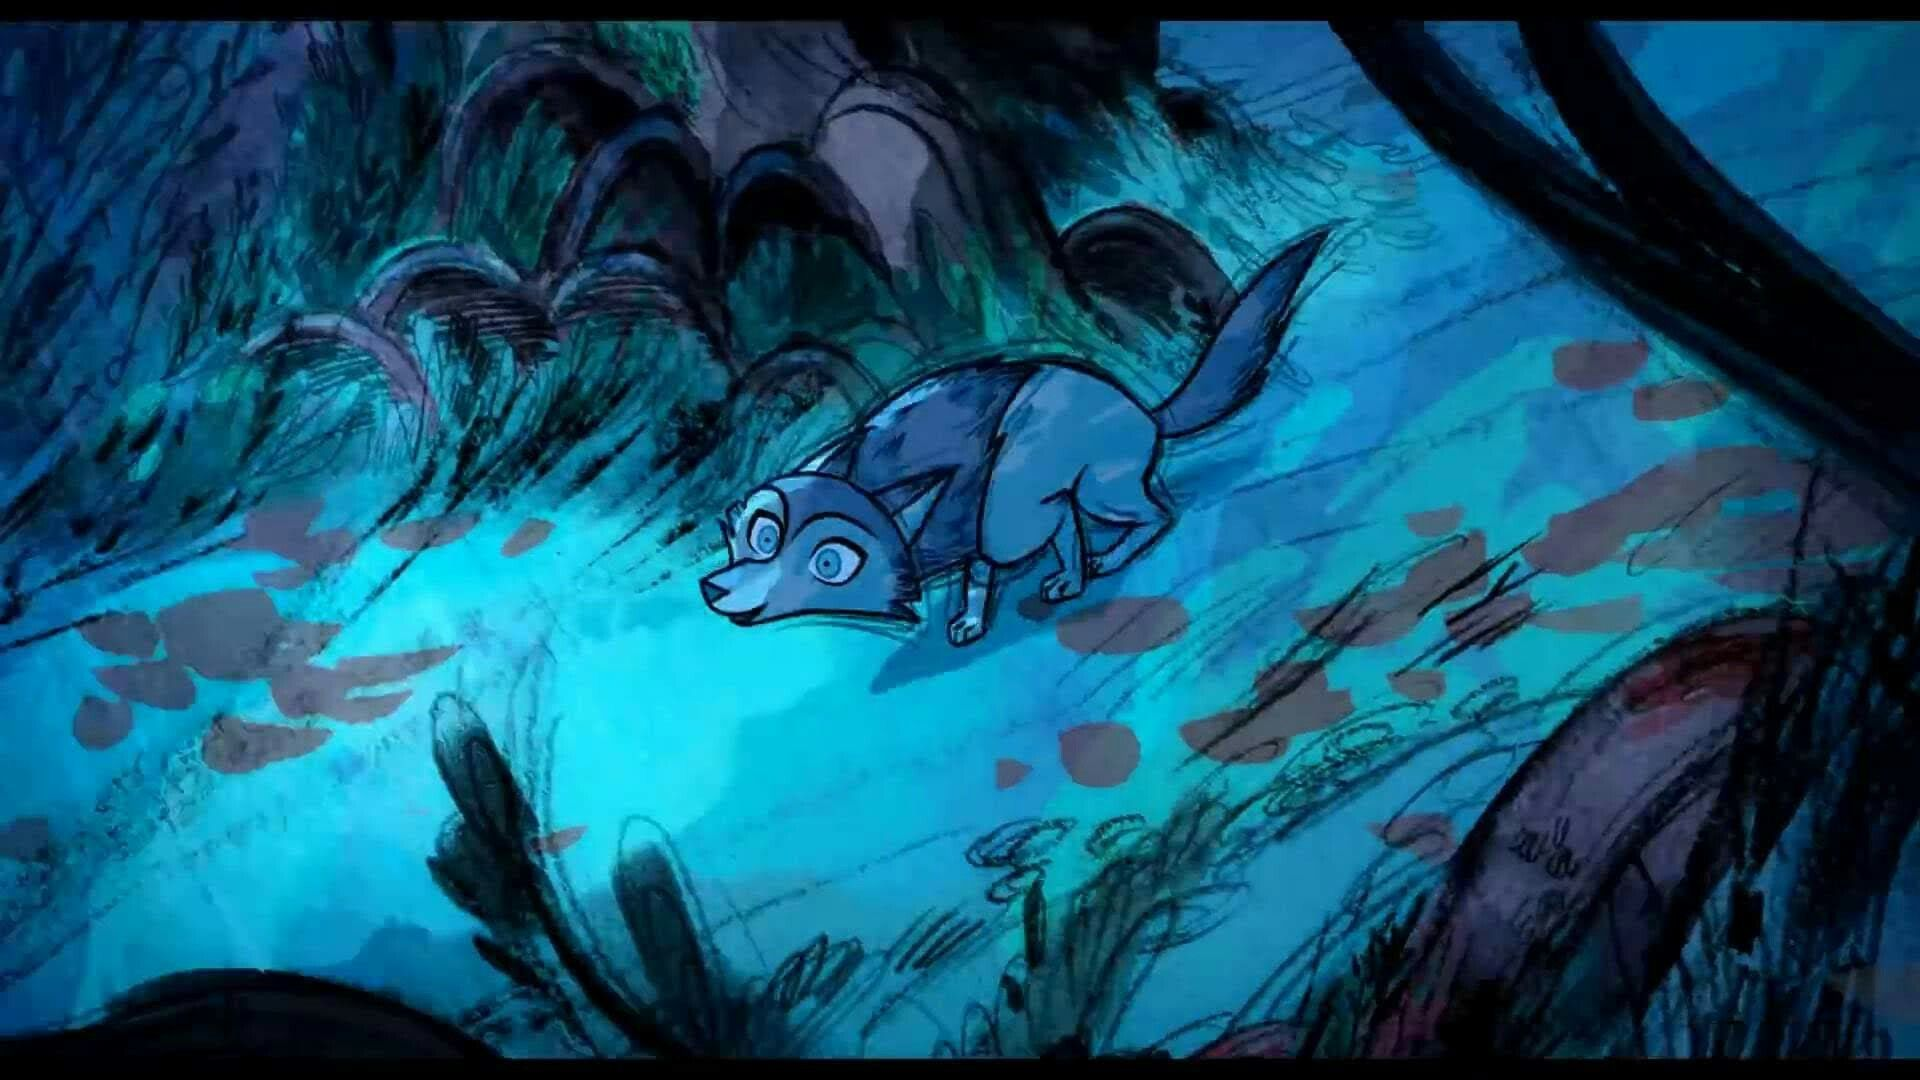 Pin by Maren Donovan on Luigi the Wolfwalker   Irish mythology, Wolf, Art